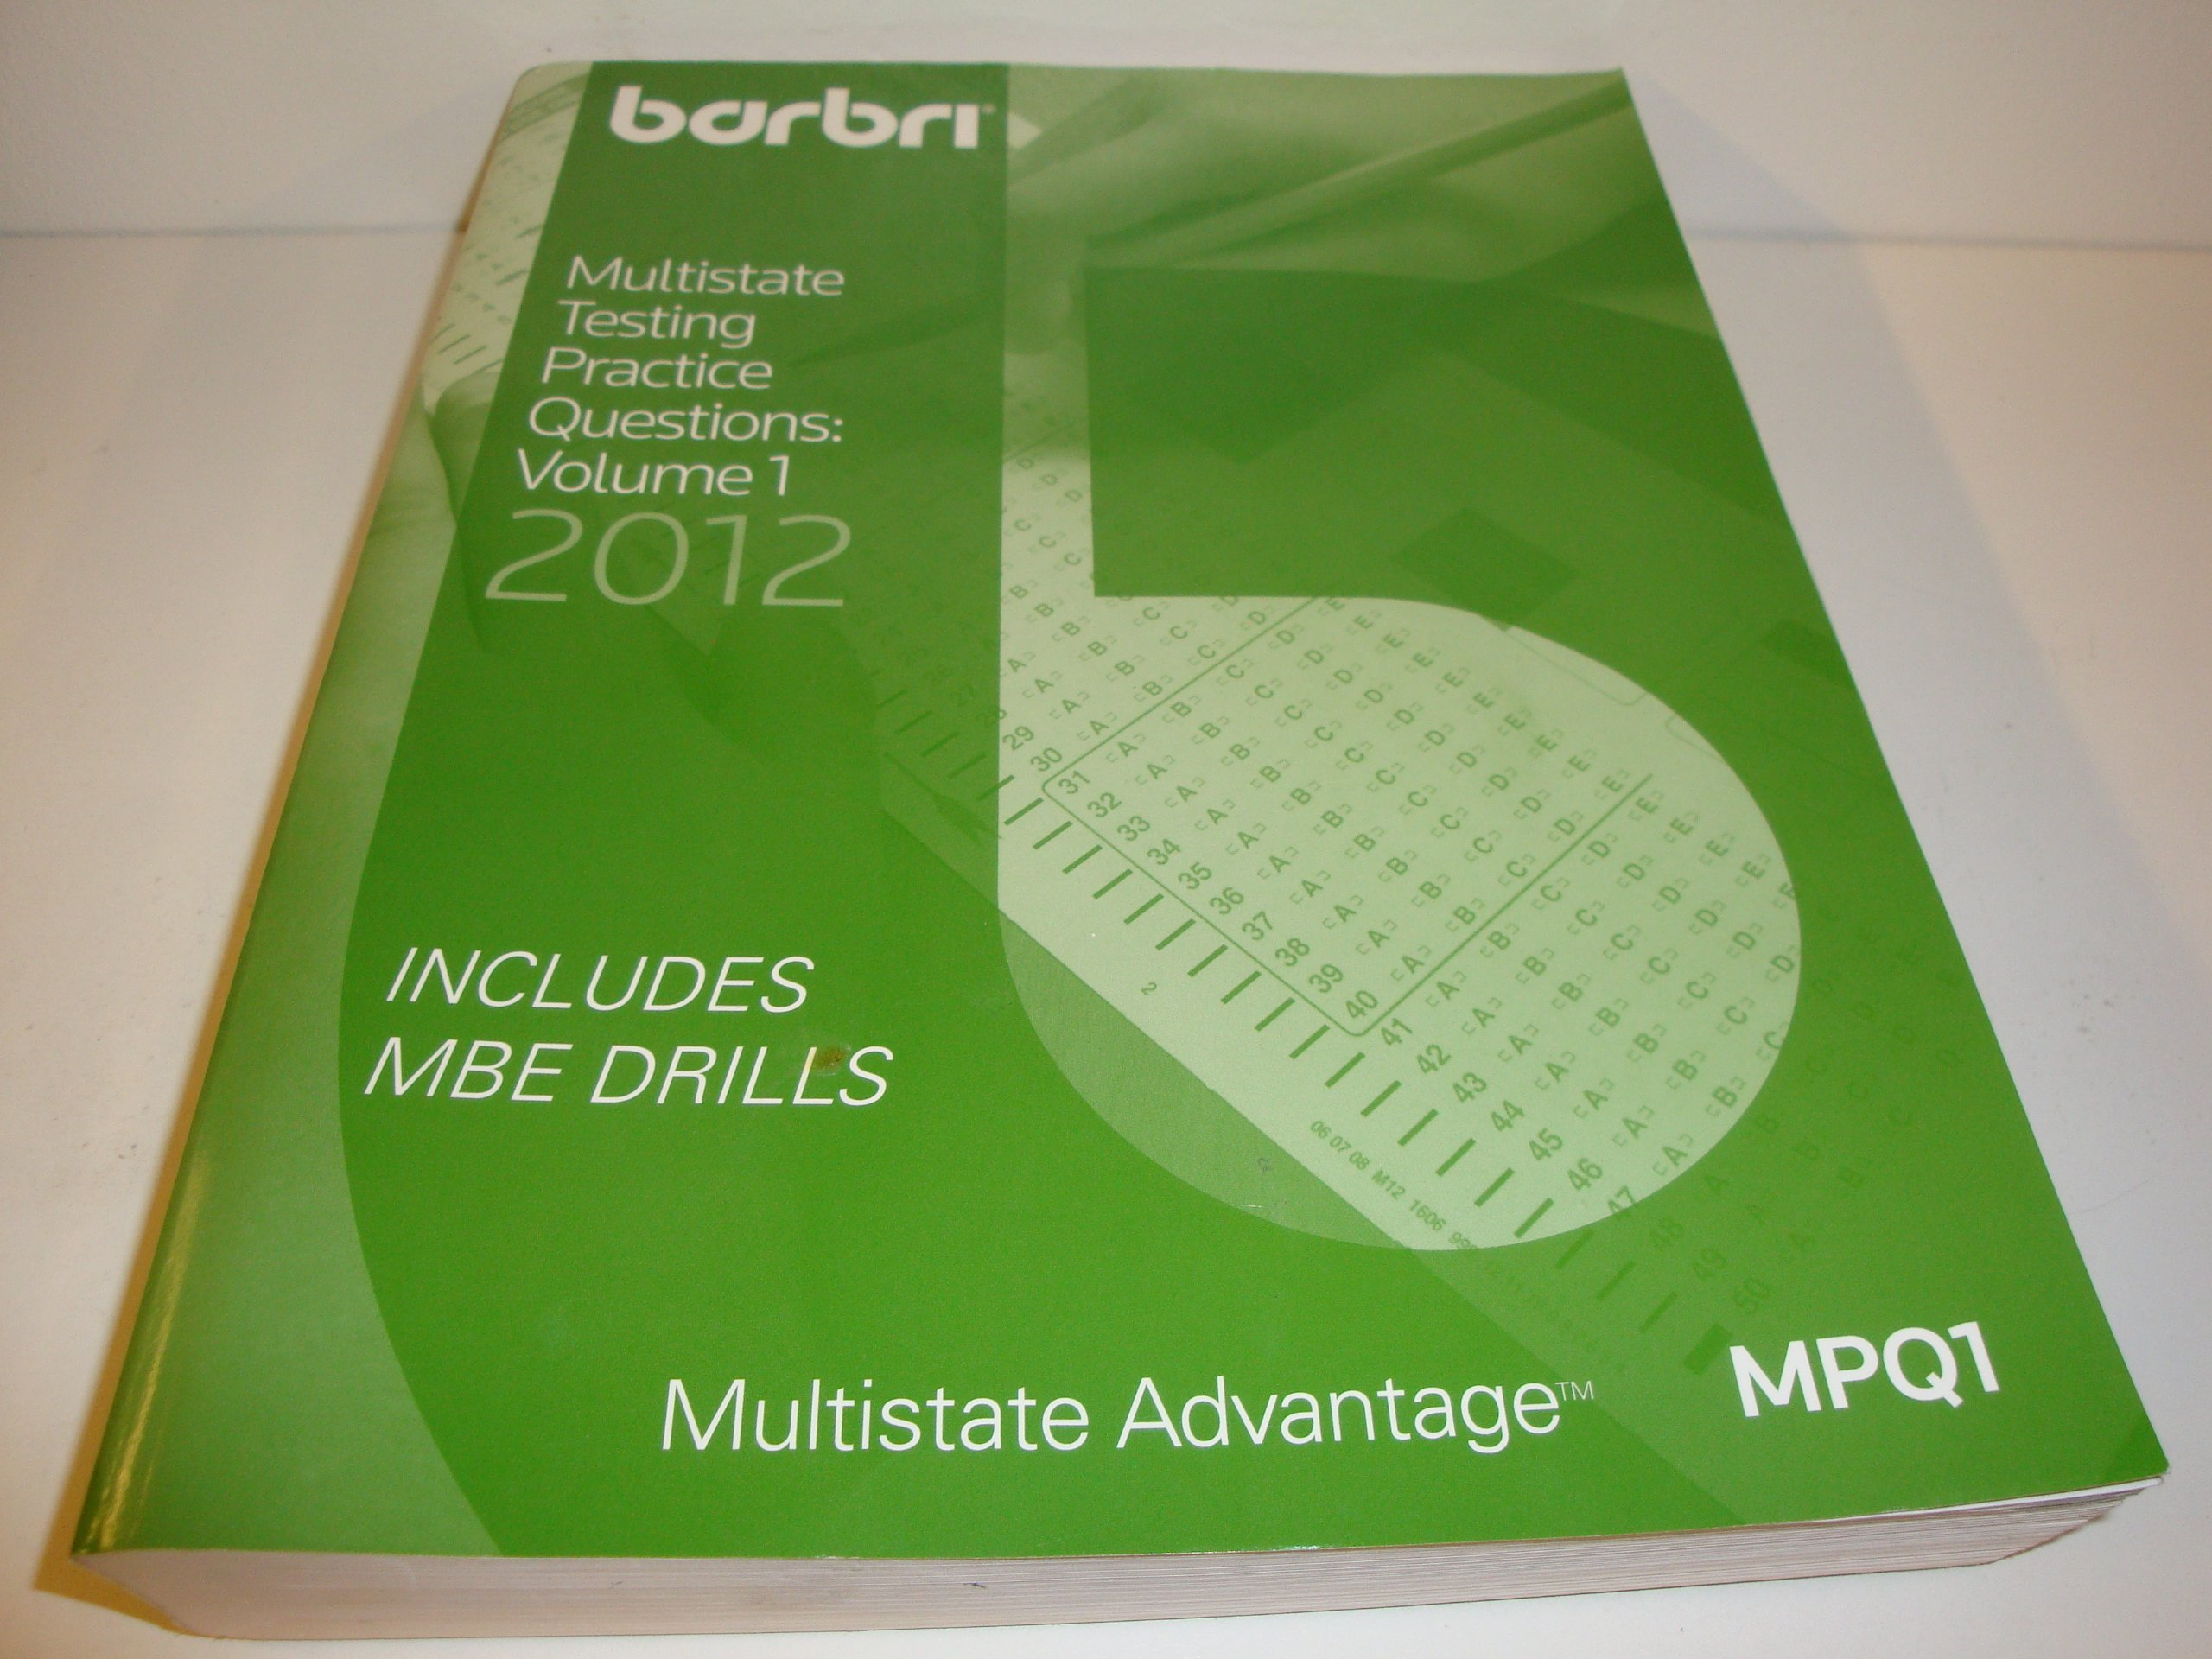 Download Barbri Multistate Testing Practice Questions Volume 1 Mutlistate Advantage Mpq1 2012 pdf epub